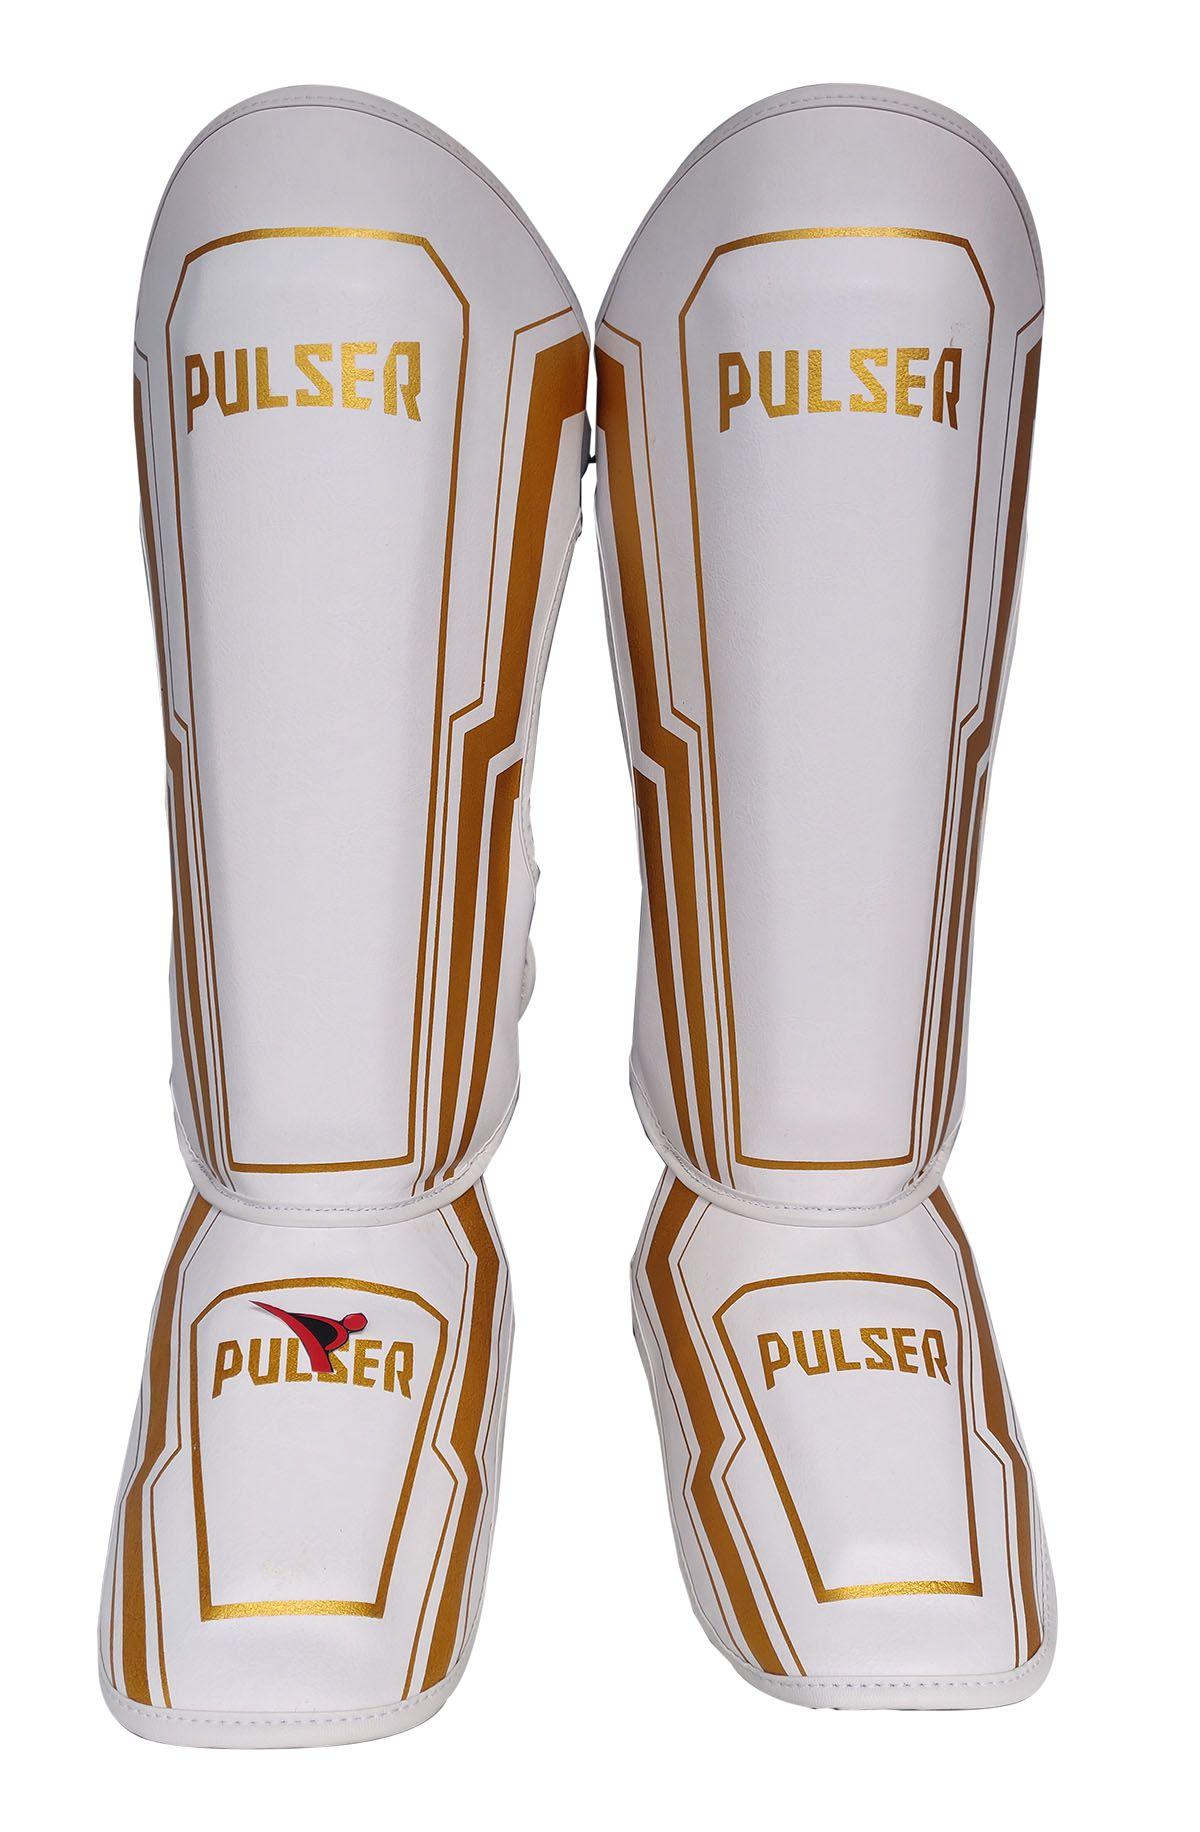 Caneleira Muay Thai MMA Branco Iron Grande 30mm - Pulser  - PRALUTA SHOP